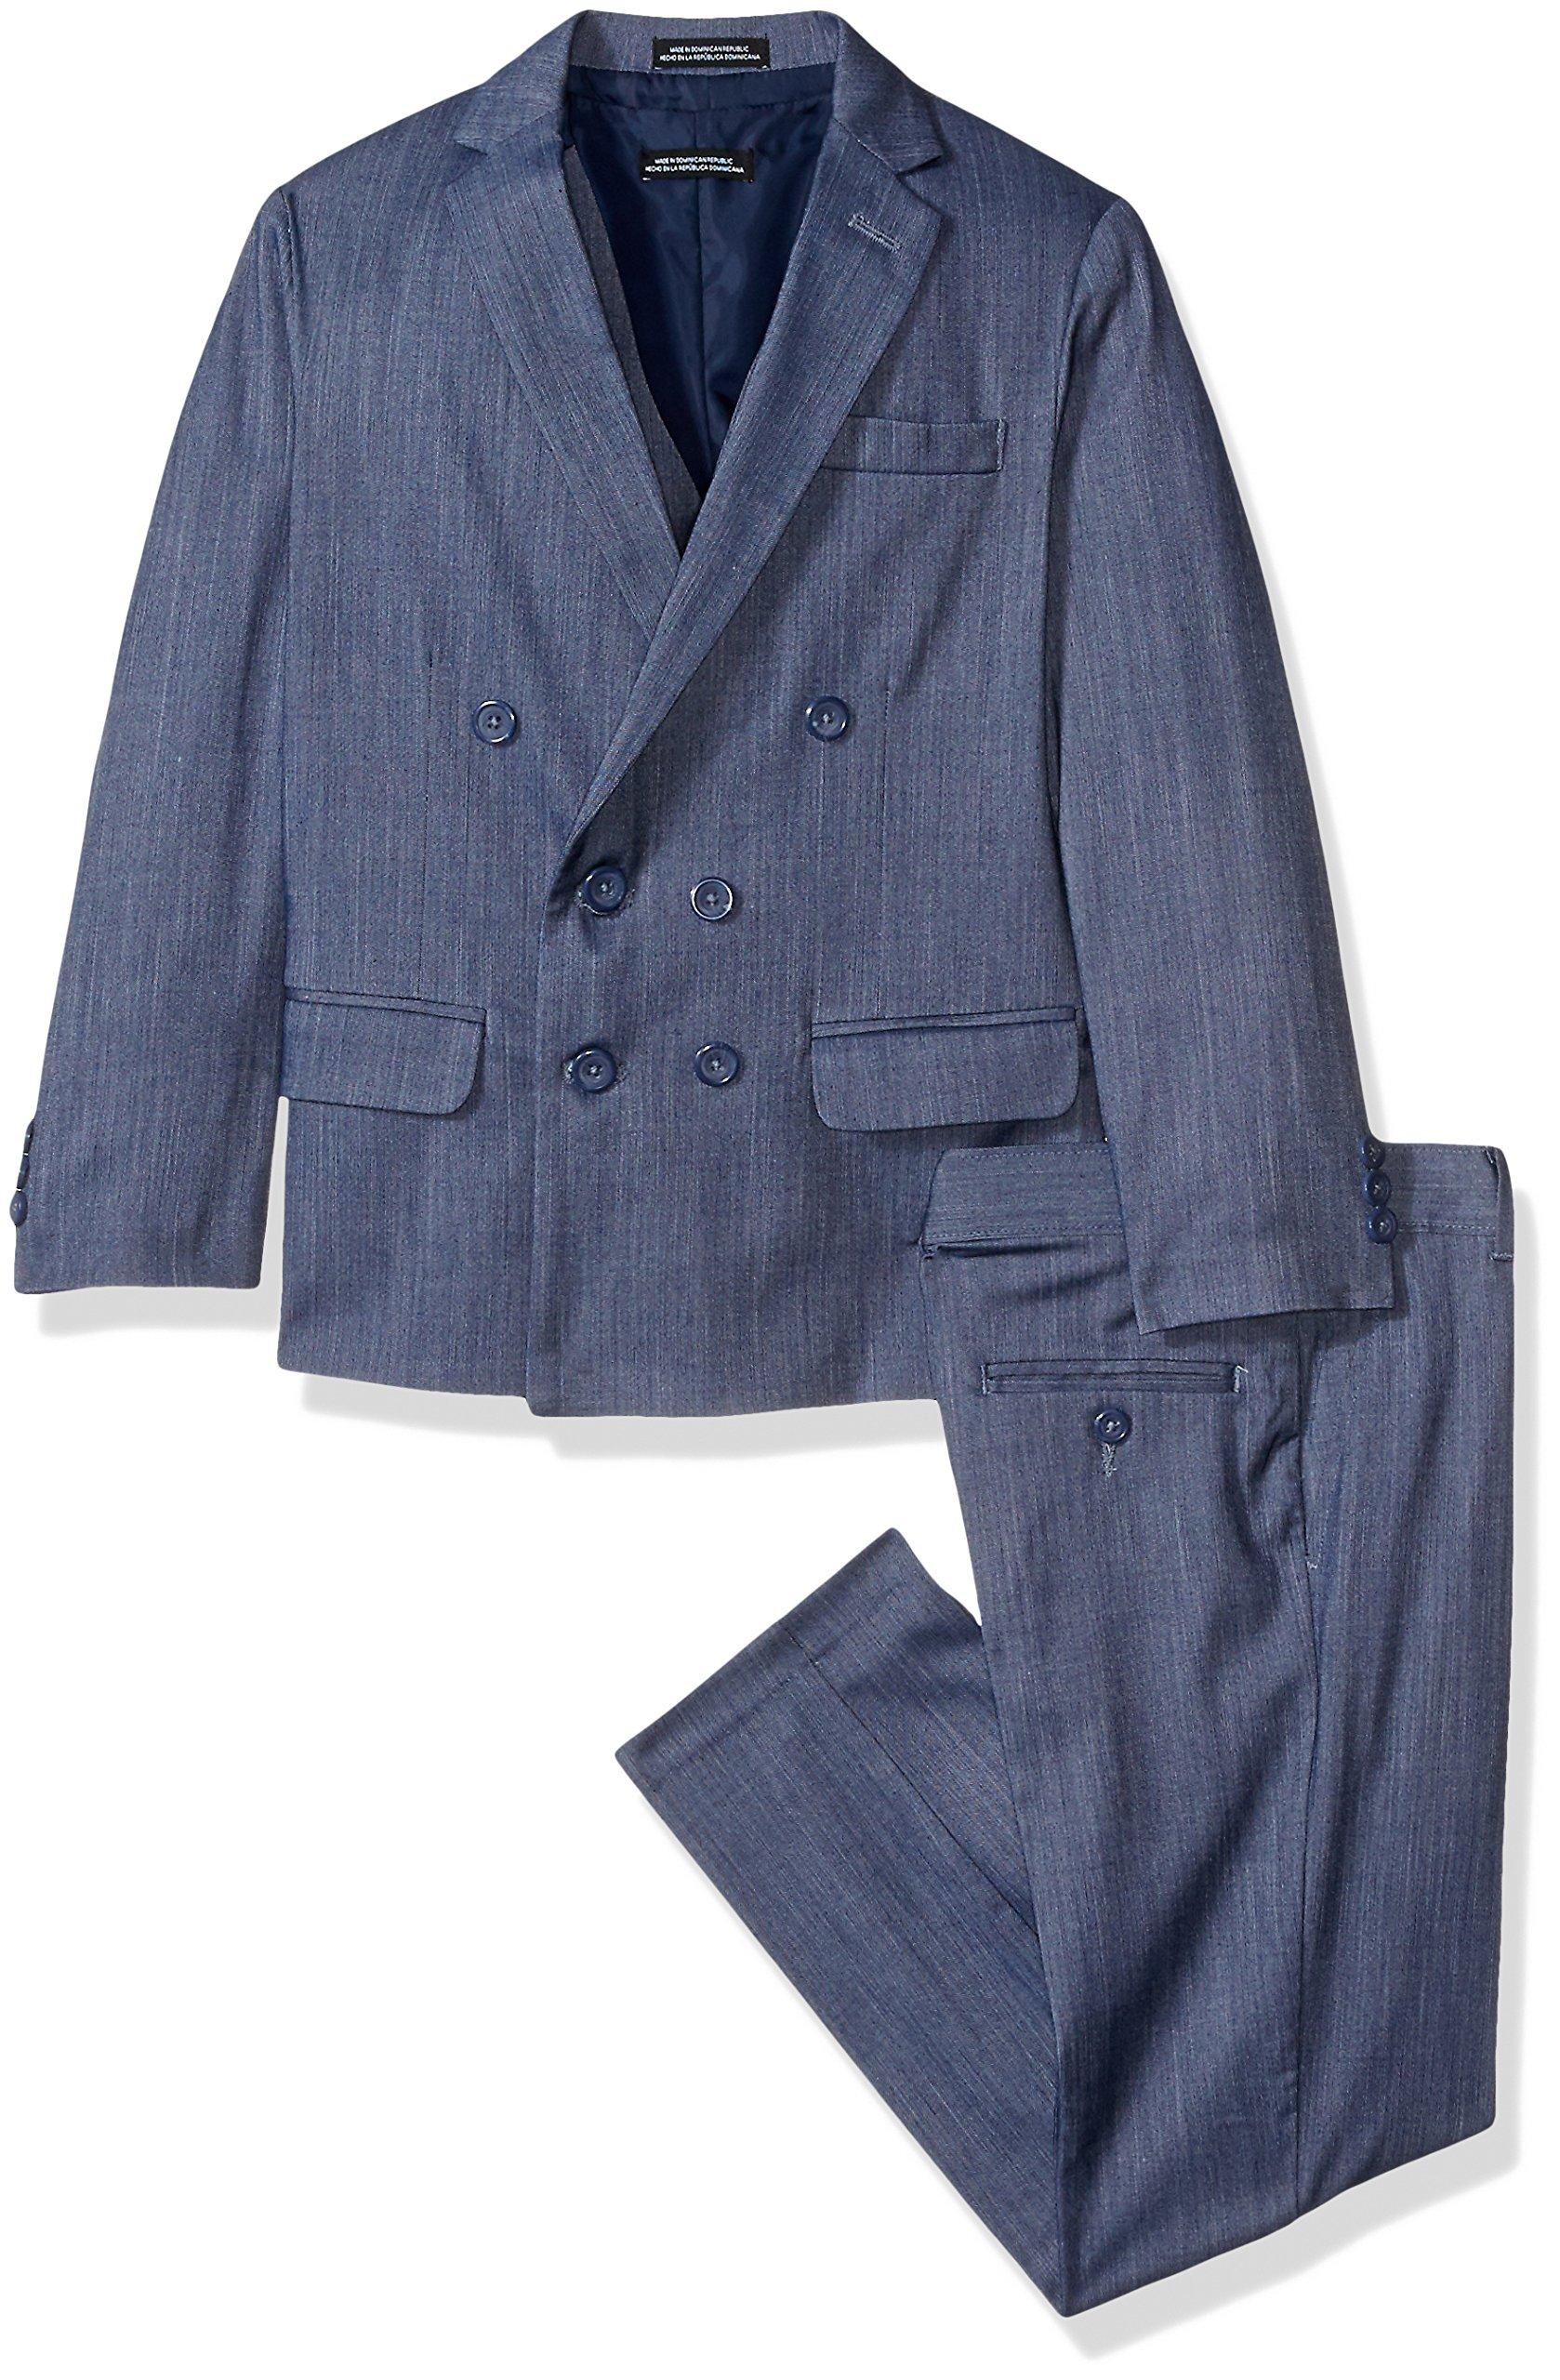 Steve Harvey Big Boys' Three Piece Suit Set, Navy Denim, 16